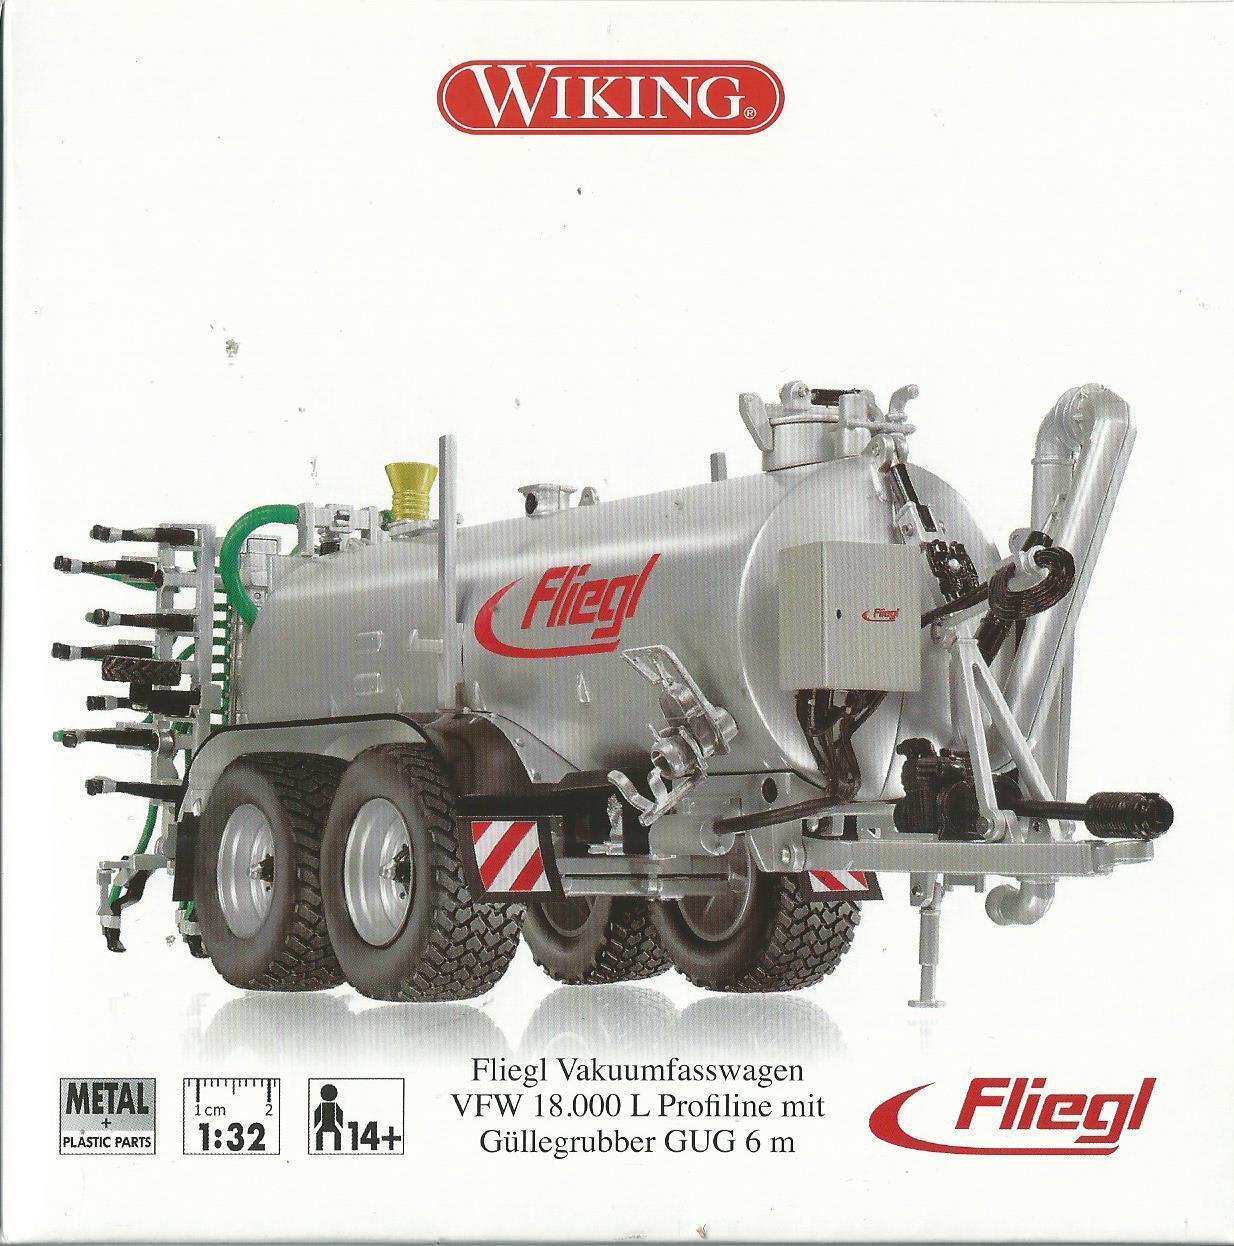 WIKING 1 32 REMOLQUE DE METAL FLIEGL VFW 18.000 L 14+ ARTE 7338